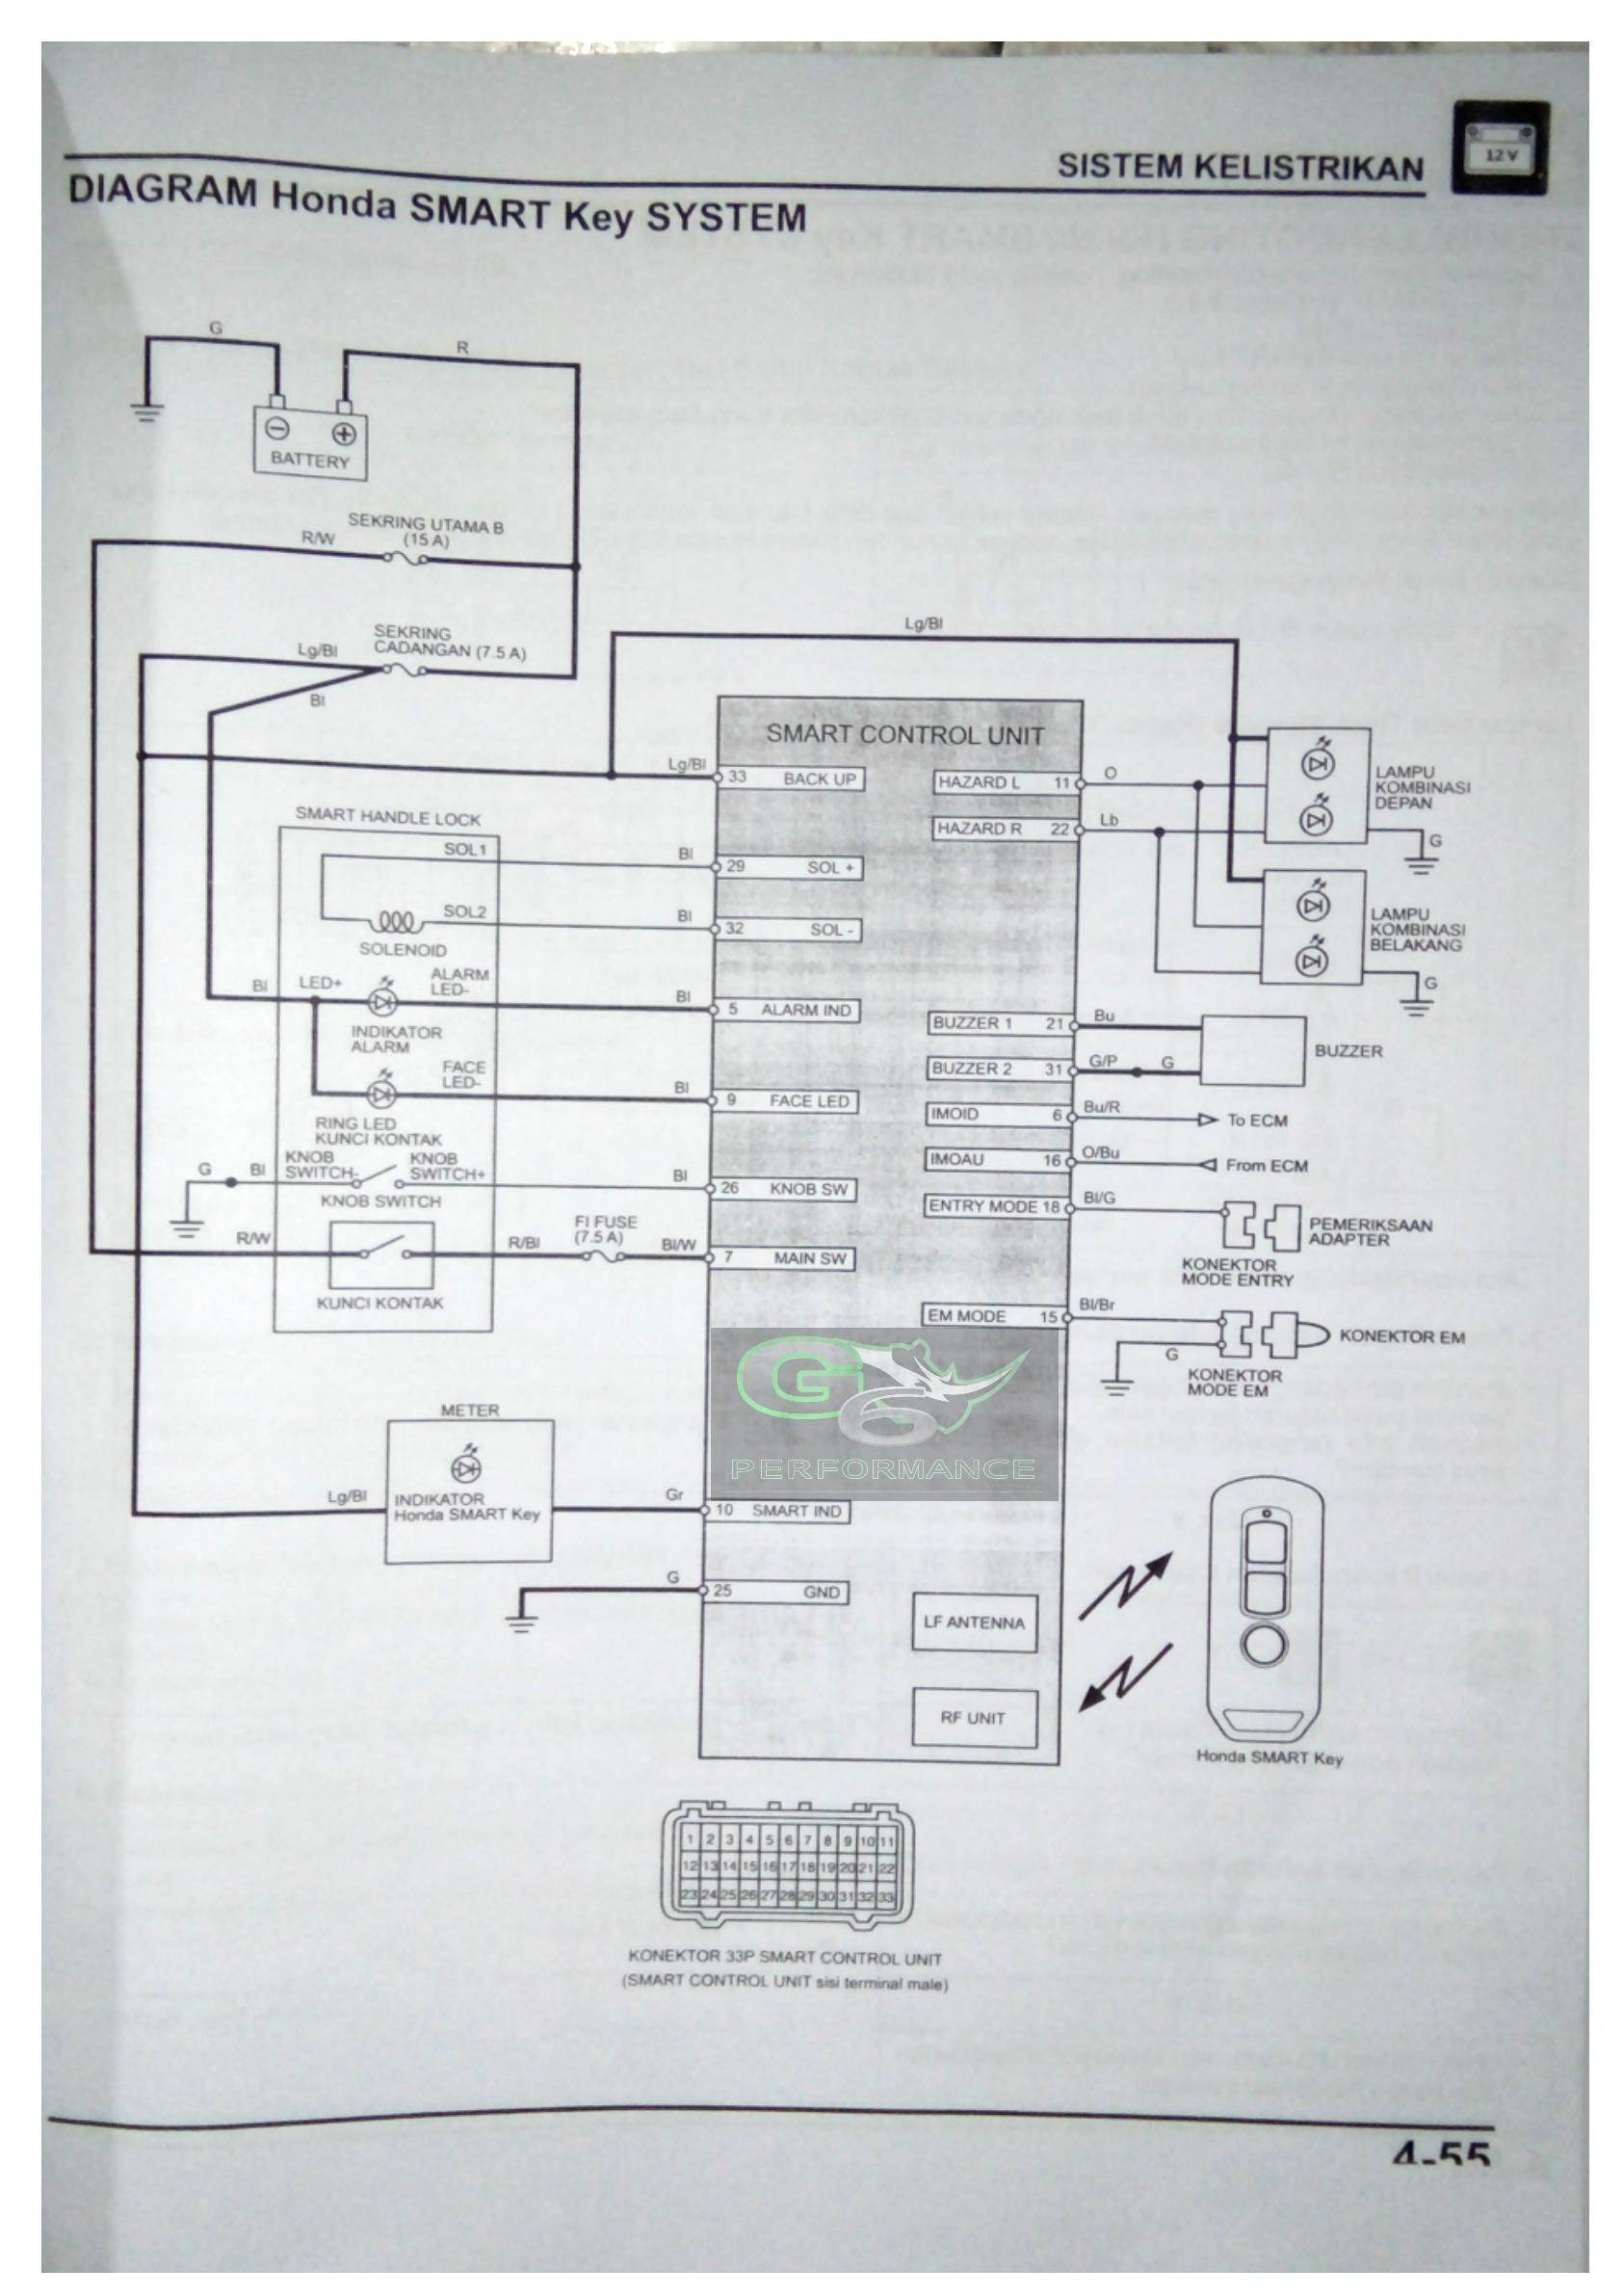 electric wiring system diagram honda new pcx 150 2018 gisix s blog honda scoppyi 2015 wiring diagram [ 1685 x 2383 Pixel ]